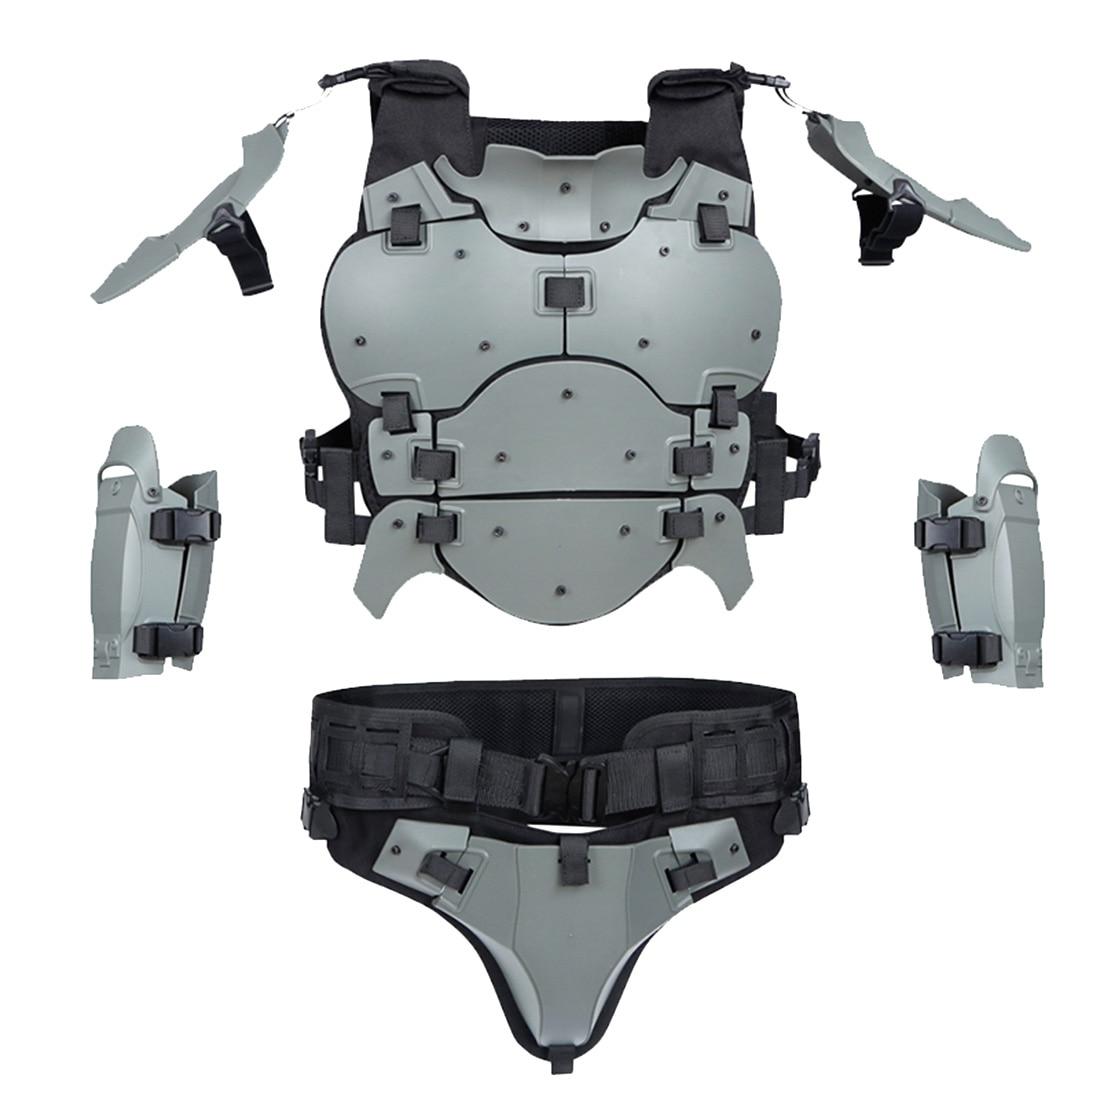 1set WST Outdoor Multi-Function Tactical Armor Set Adjustable Outdoors Tactics Accessories Elbow Pad Waist Seal - Grey Black Tan